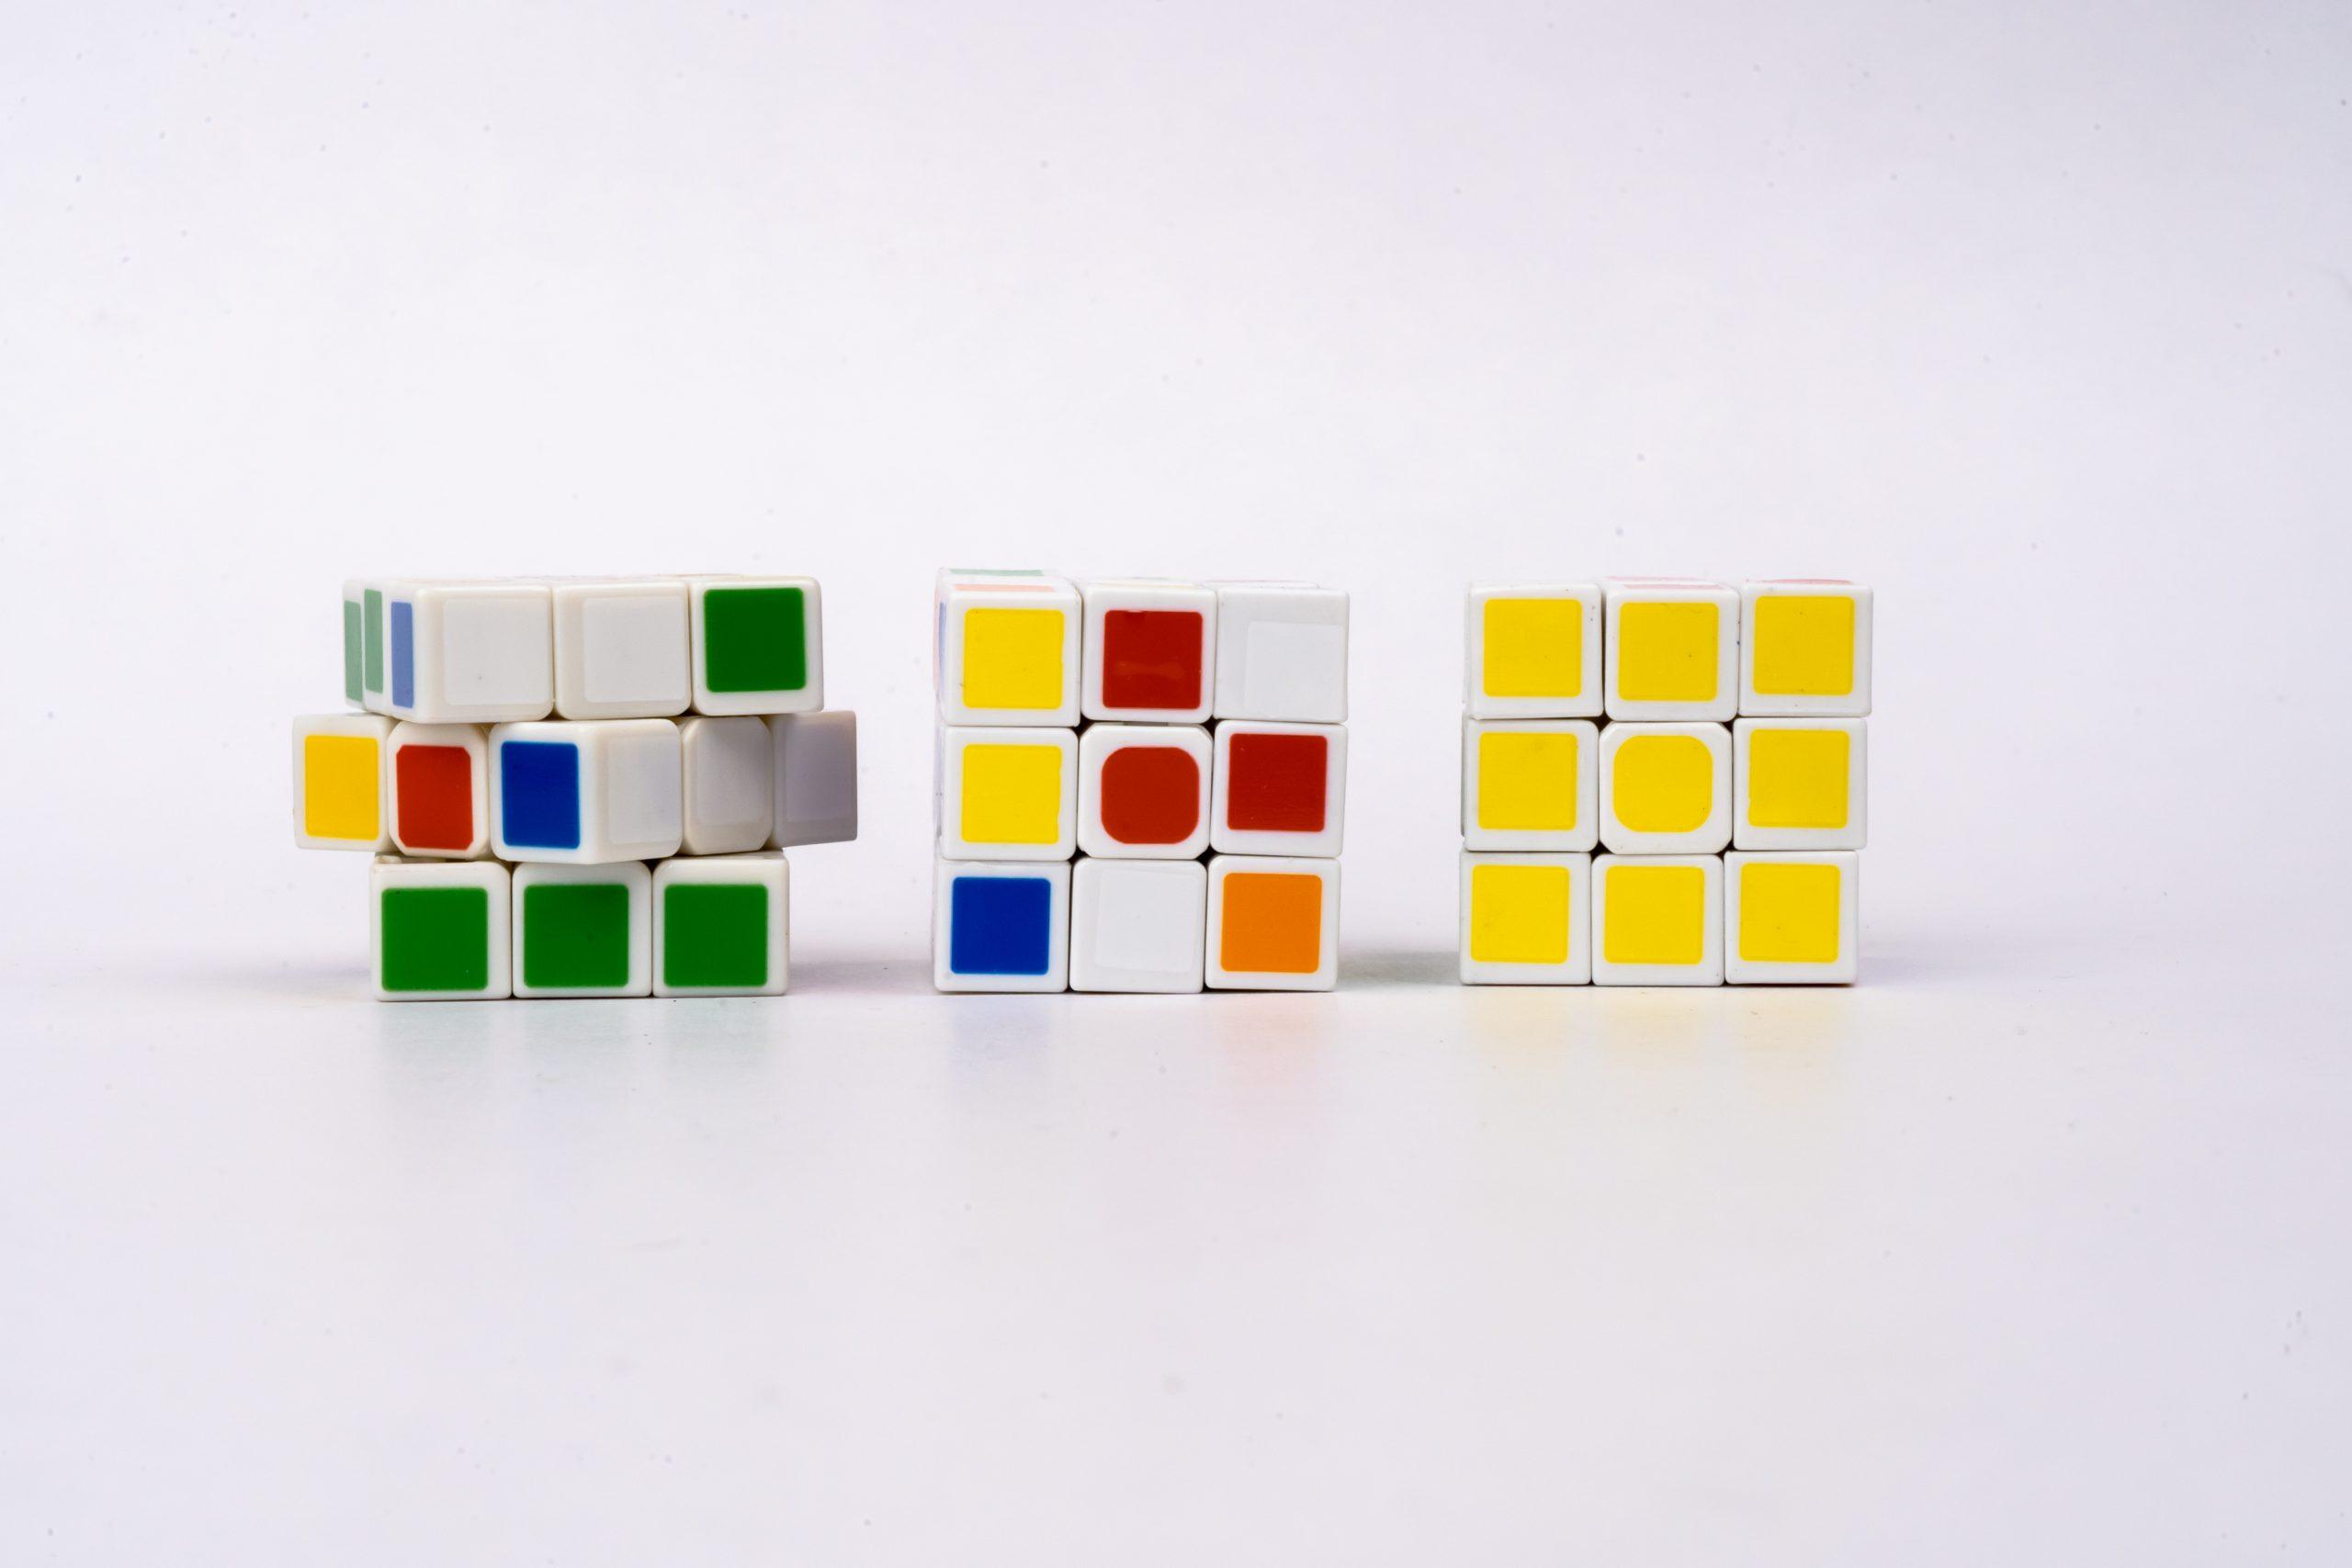 Different Rubik Cubes